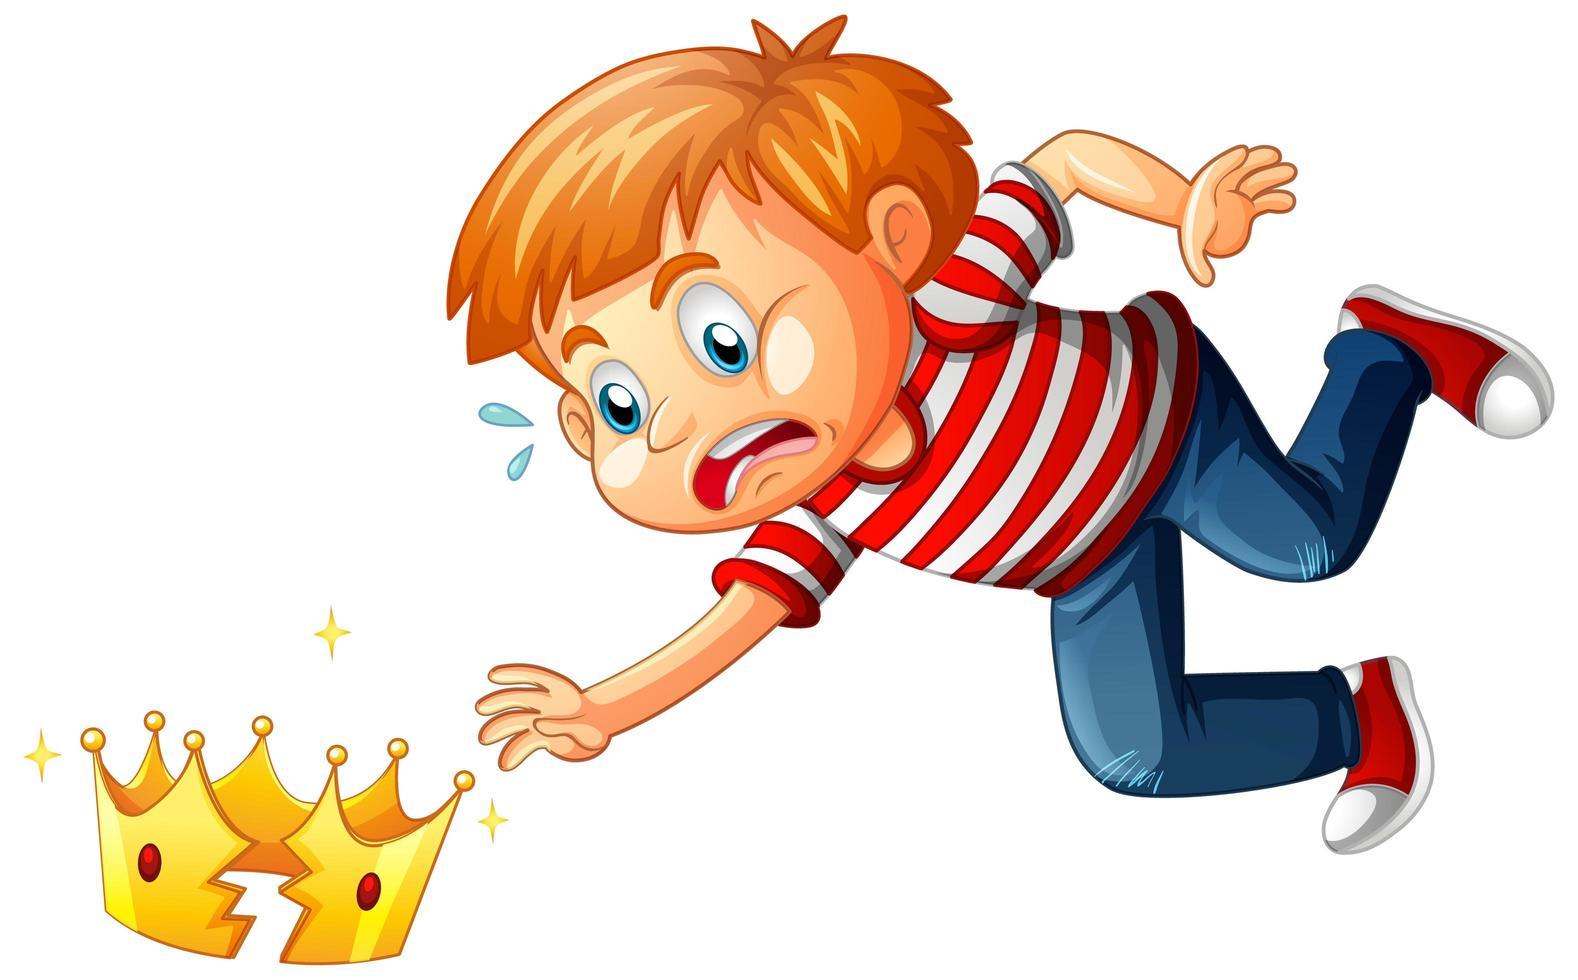 en pojke med trasig krona på vit bakgrund vektor